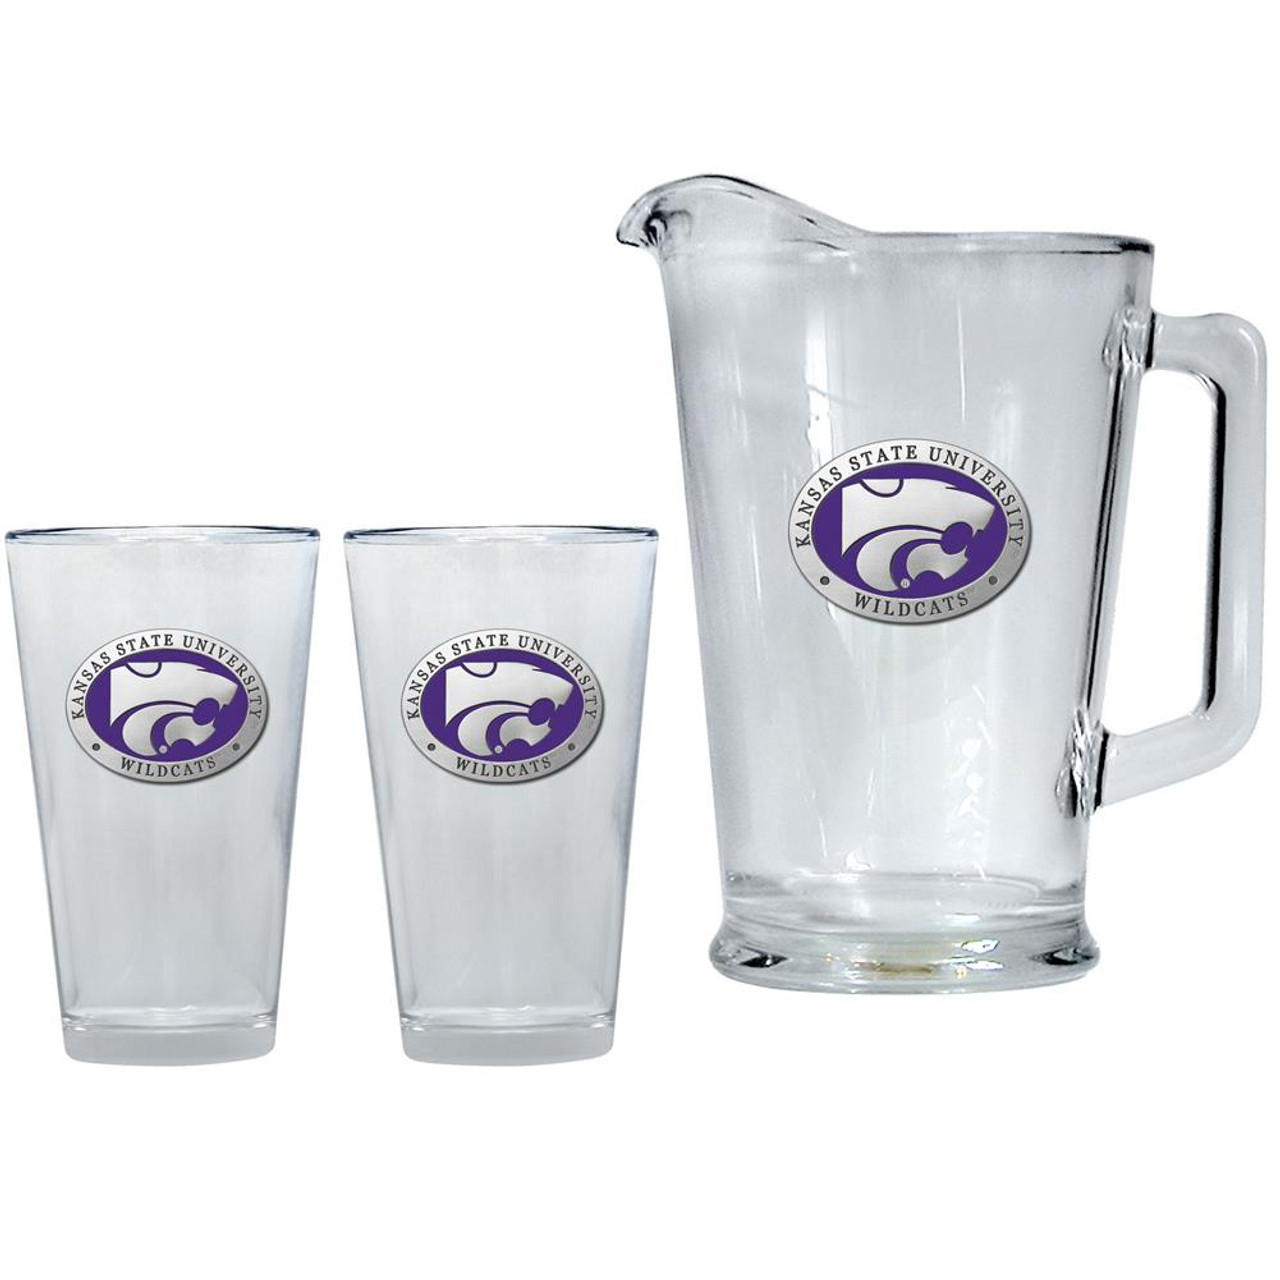 Kansas State University Pitcher and 2 Pint Glass Set Beer Set